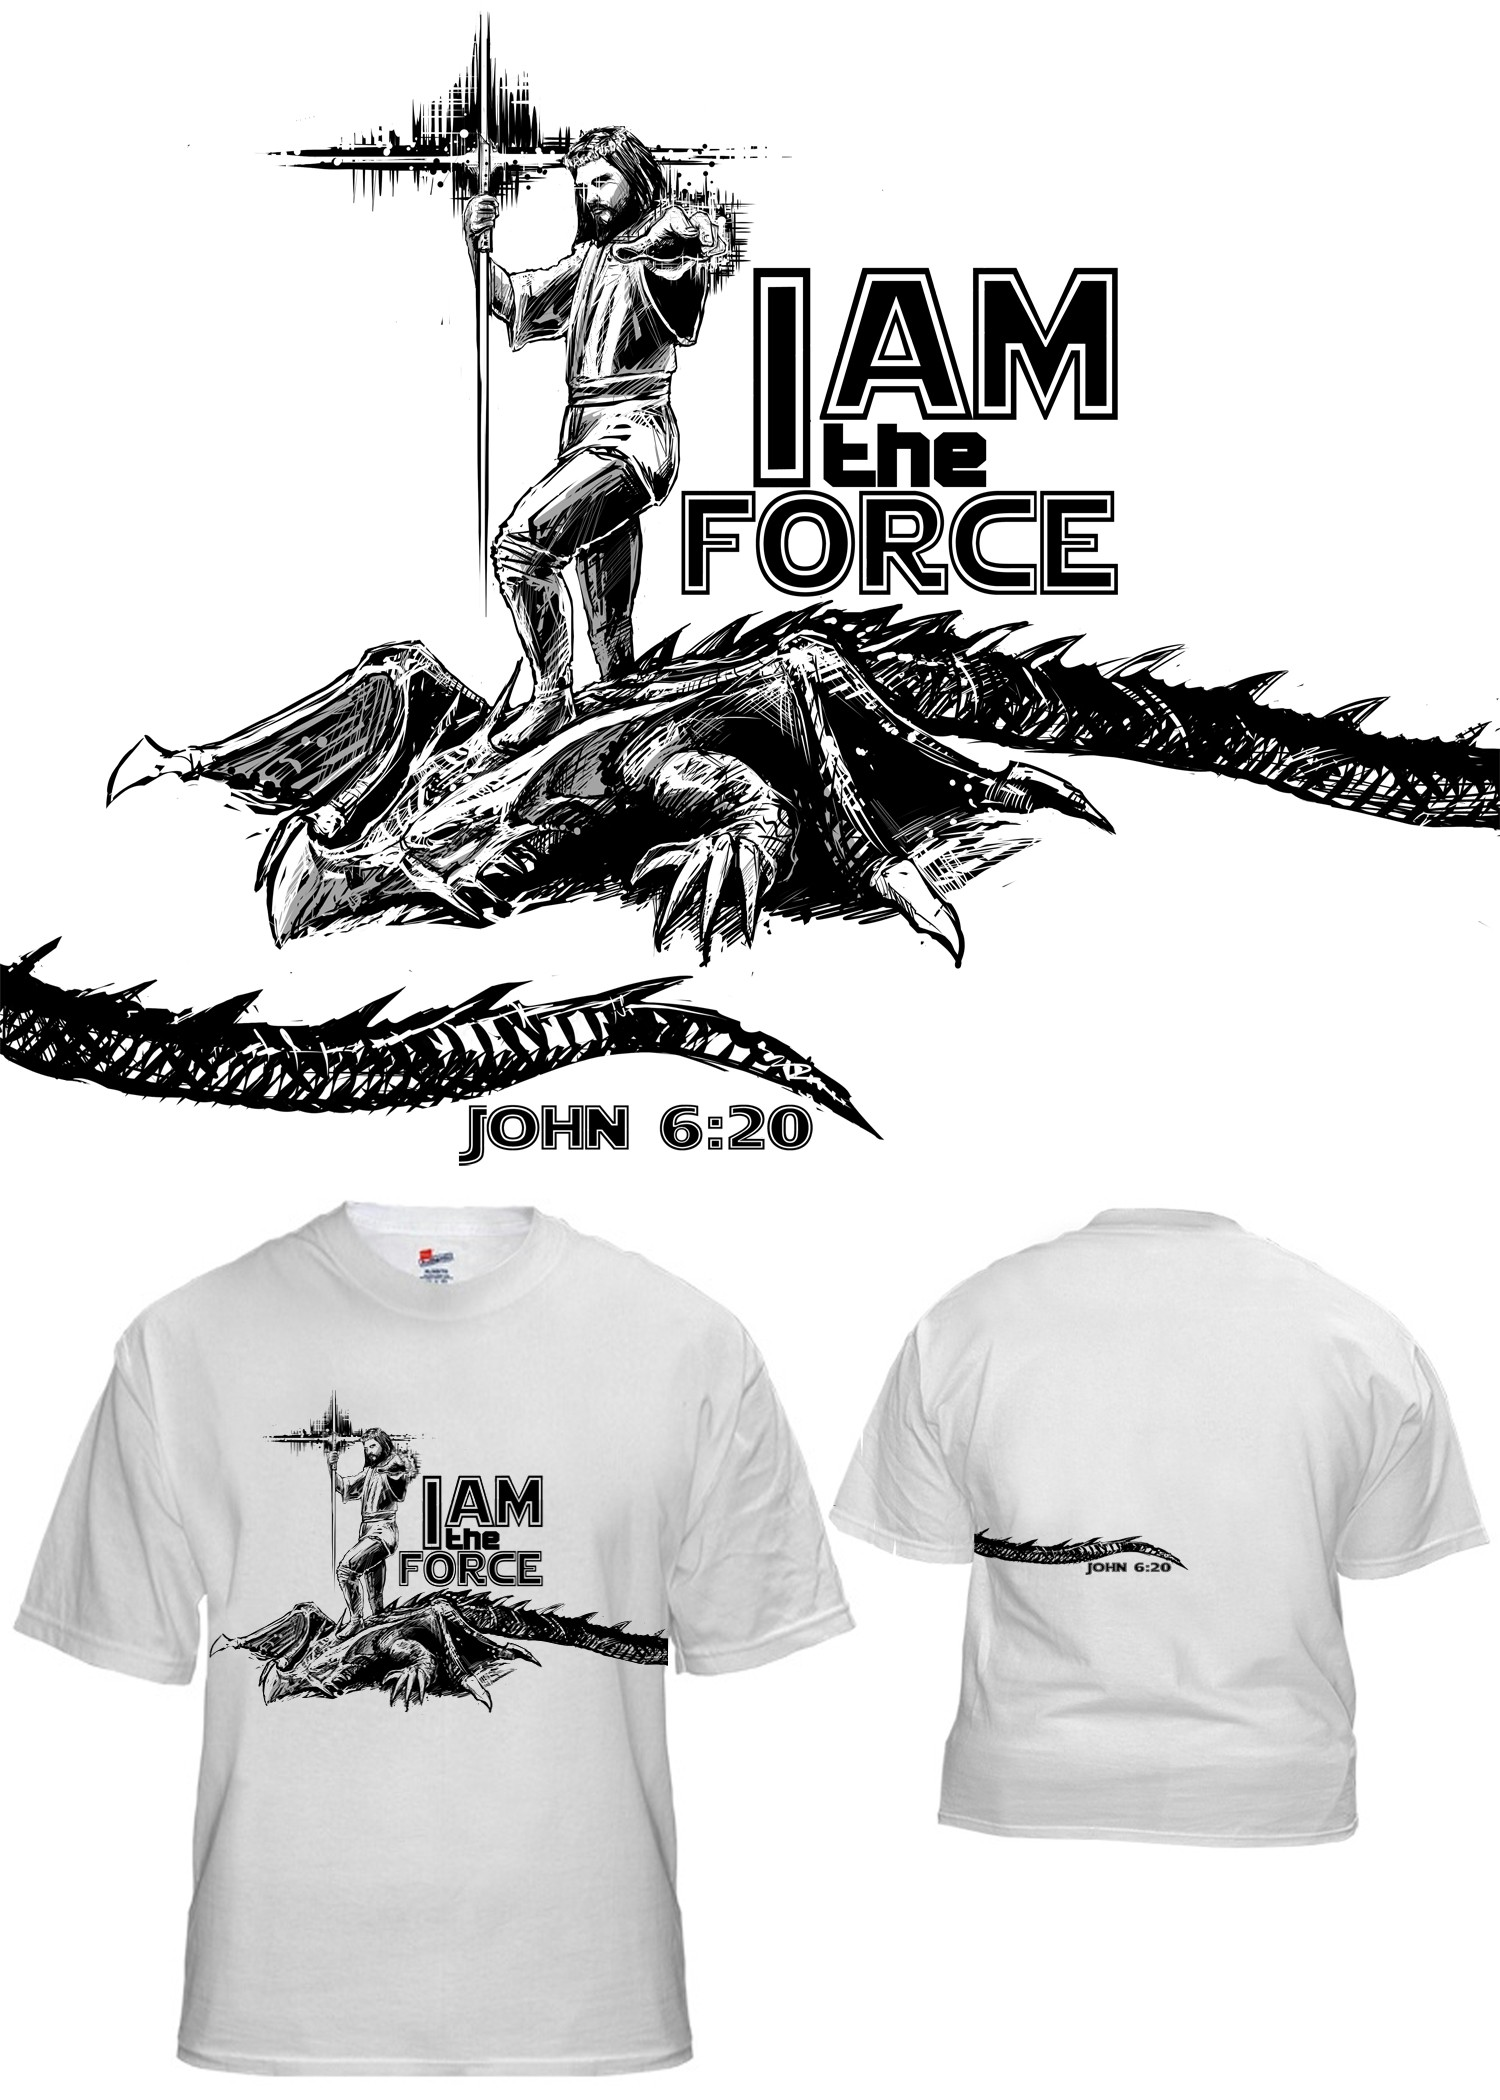 Jedi Jesus t-shirt